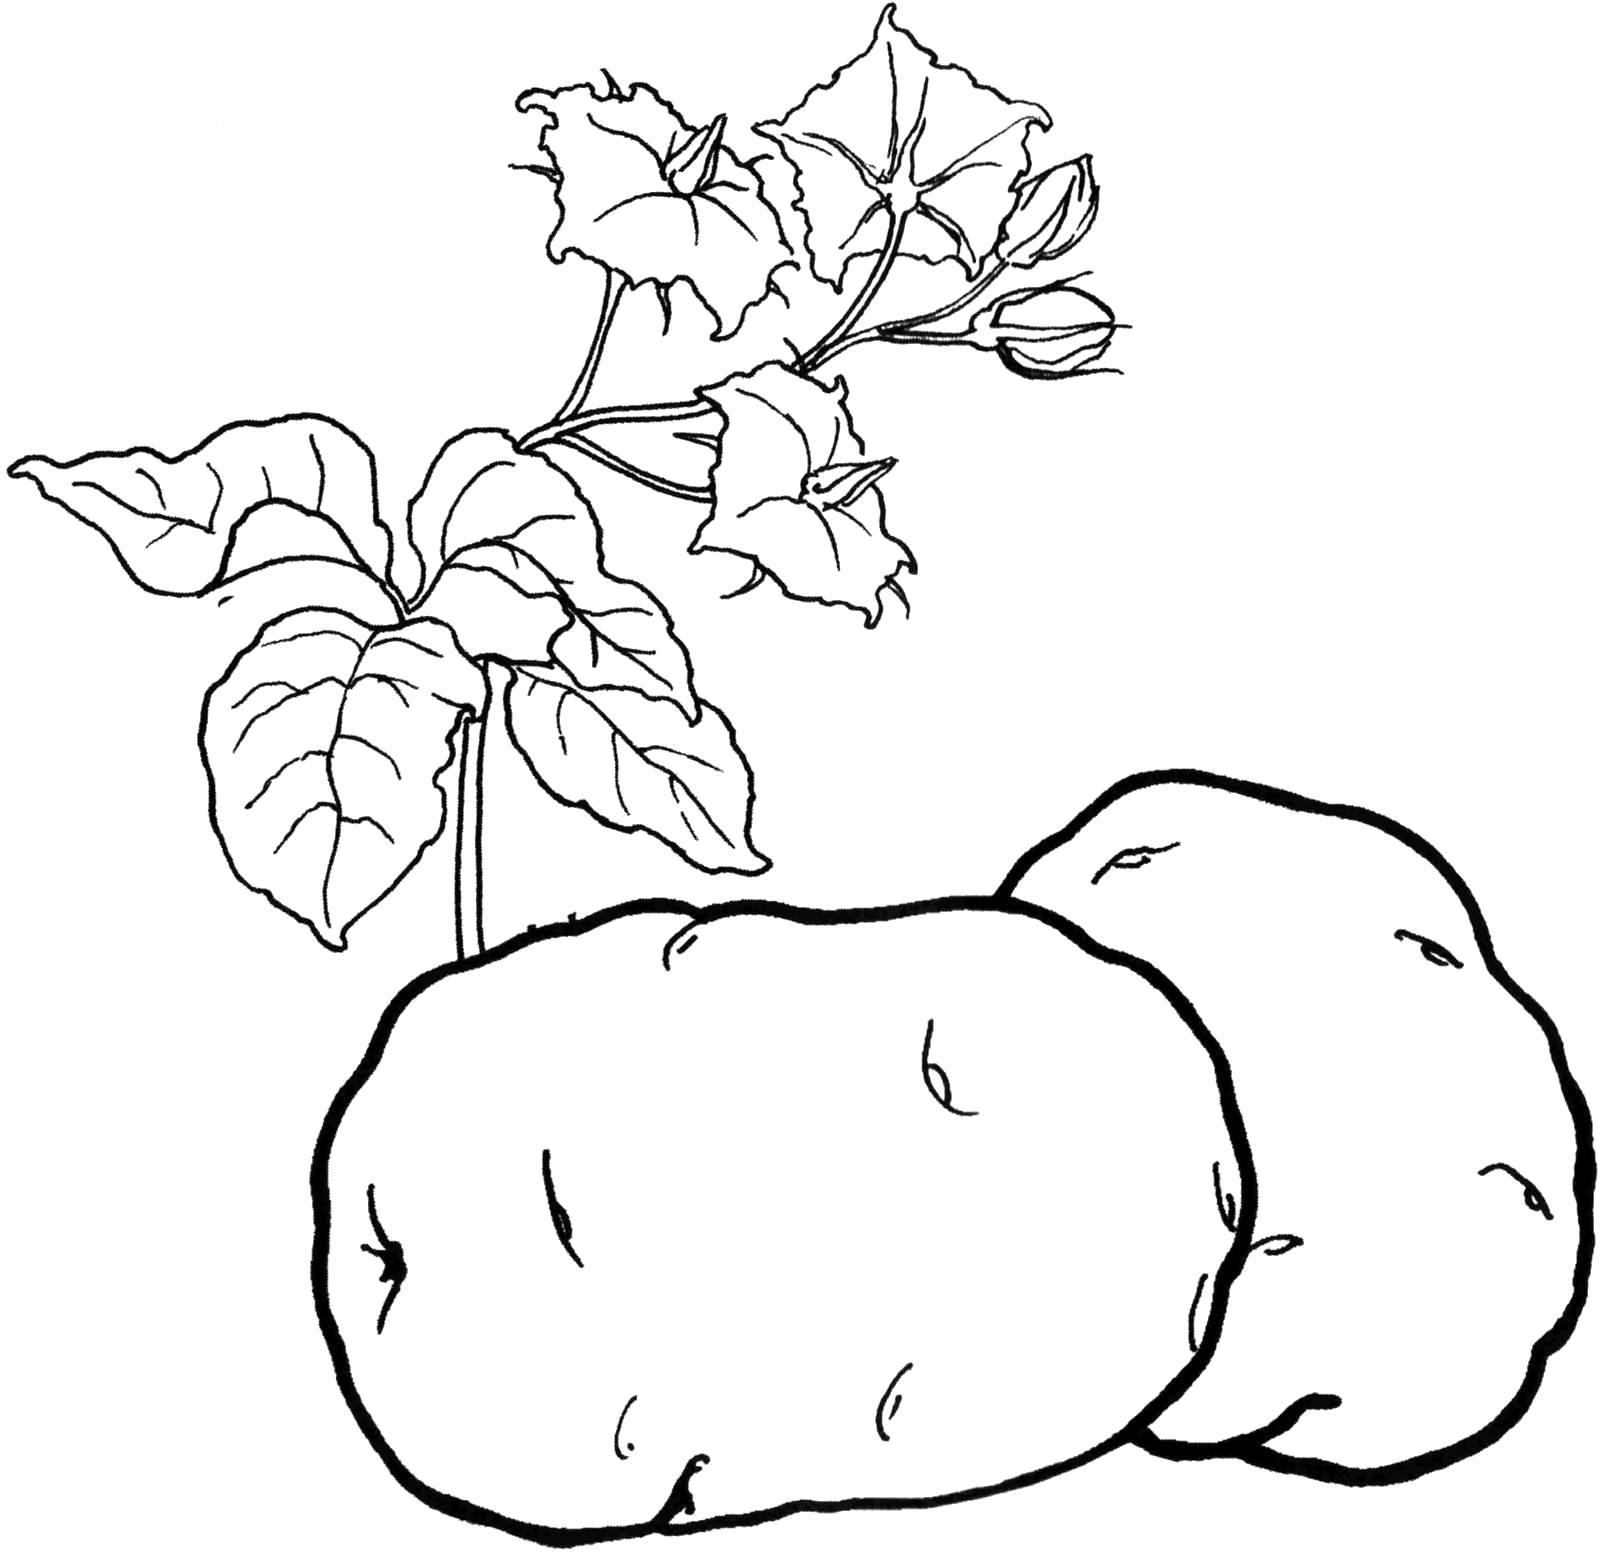 Раскраски овощи, Страница:1.